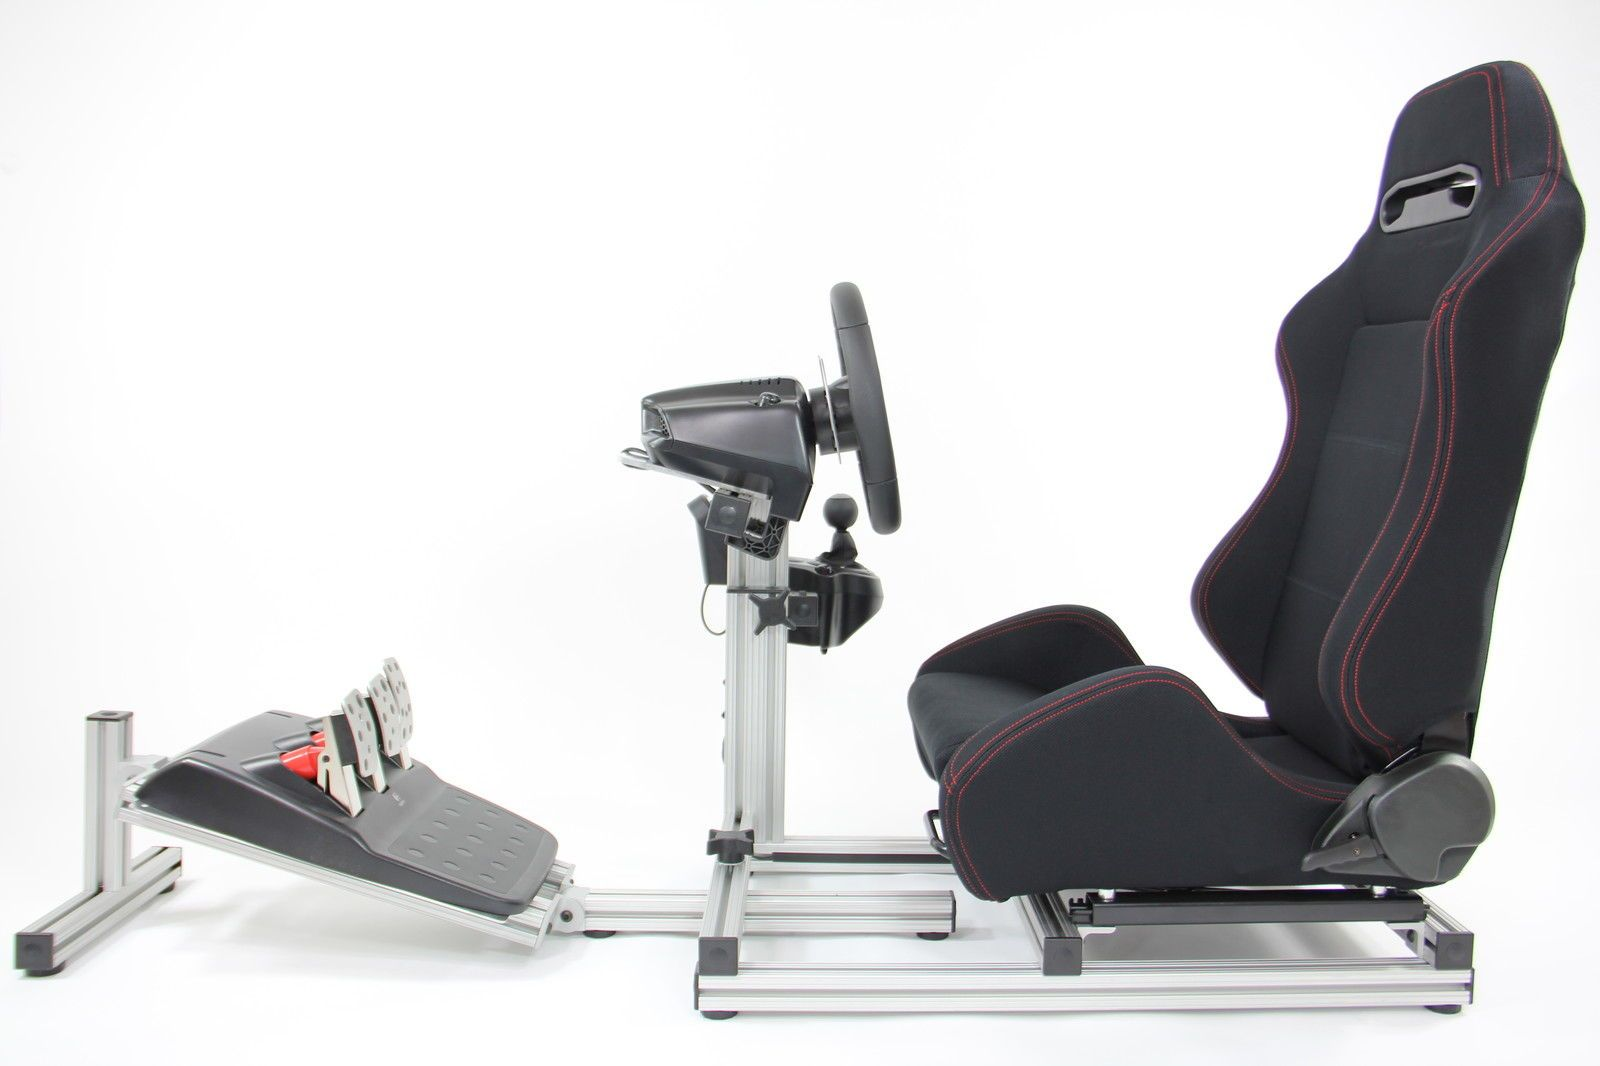 driving simulator chair wheelchair batteries 4 play racing video game sim race